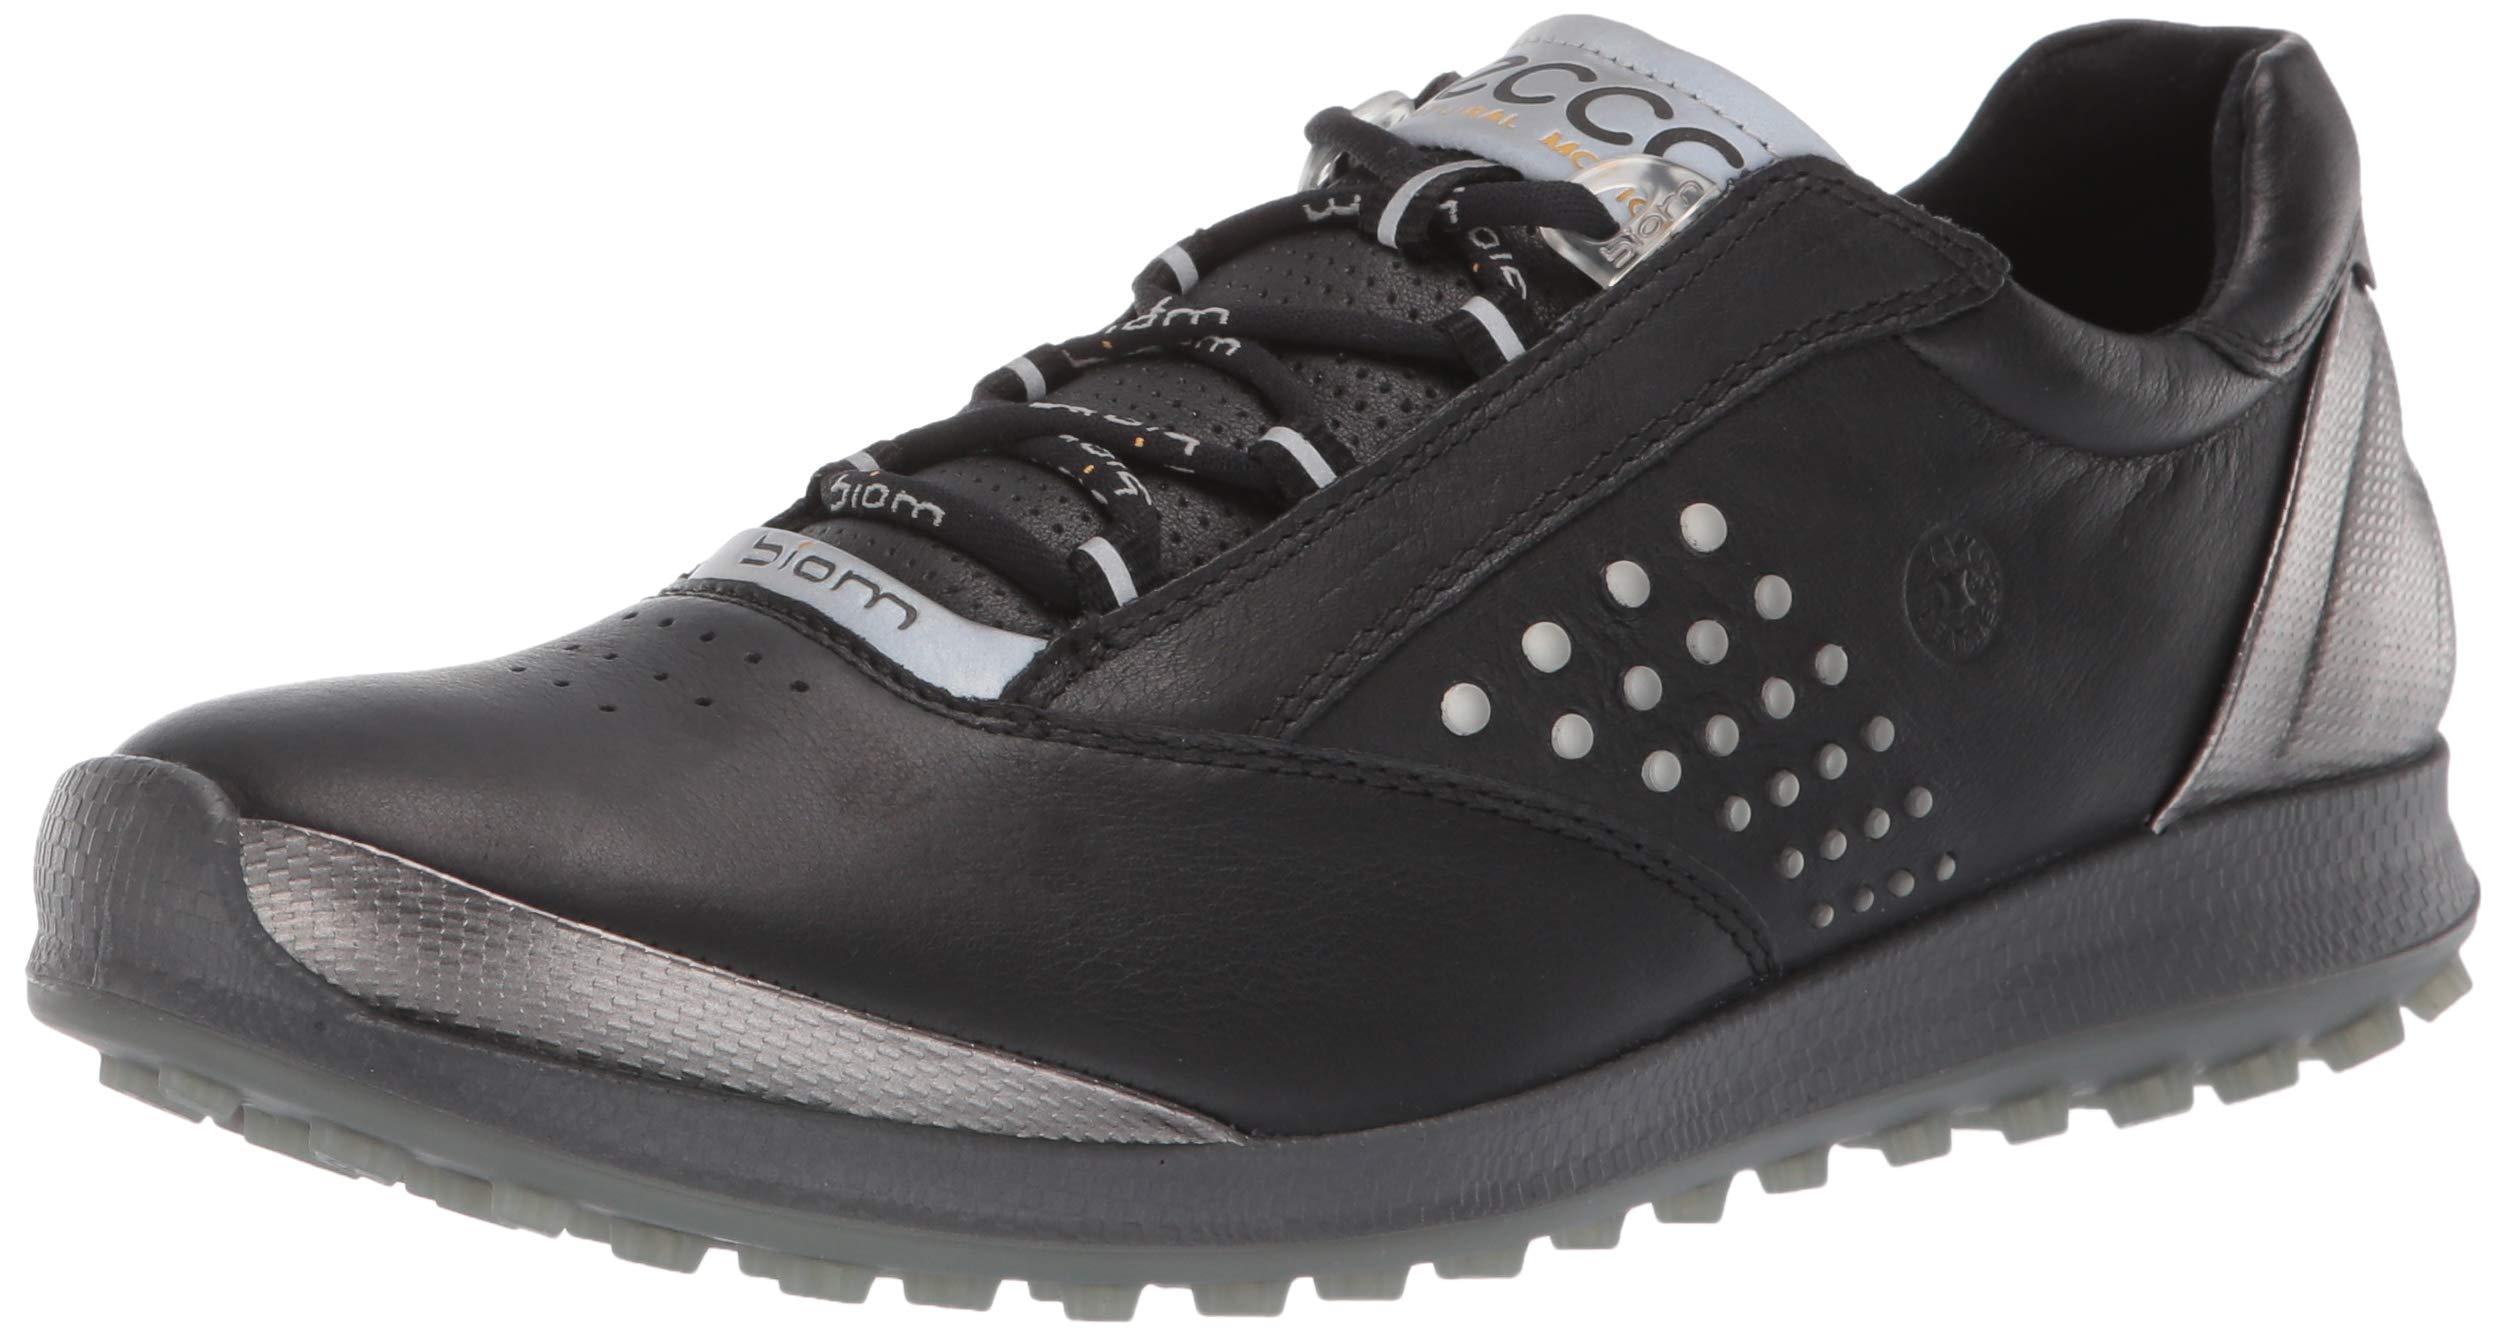 ECCO Women's Biom Hybrid 2 Golf Shoe, Black Yak Leather, 10 M US by ECCO